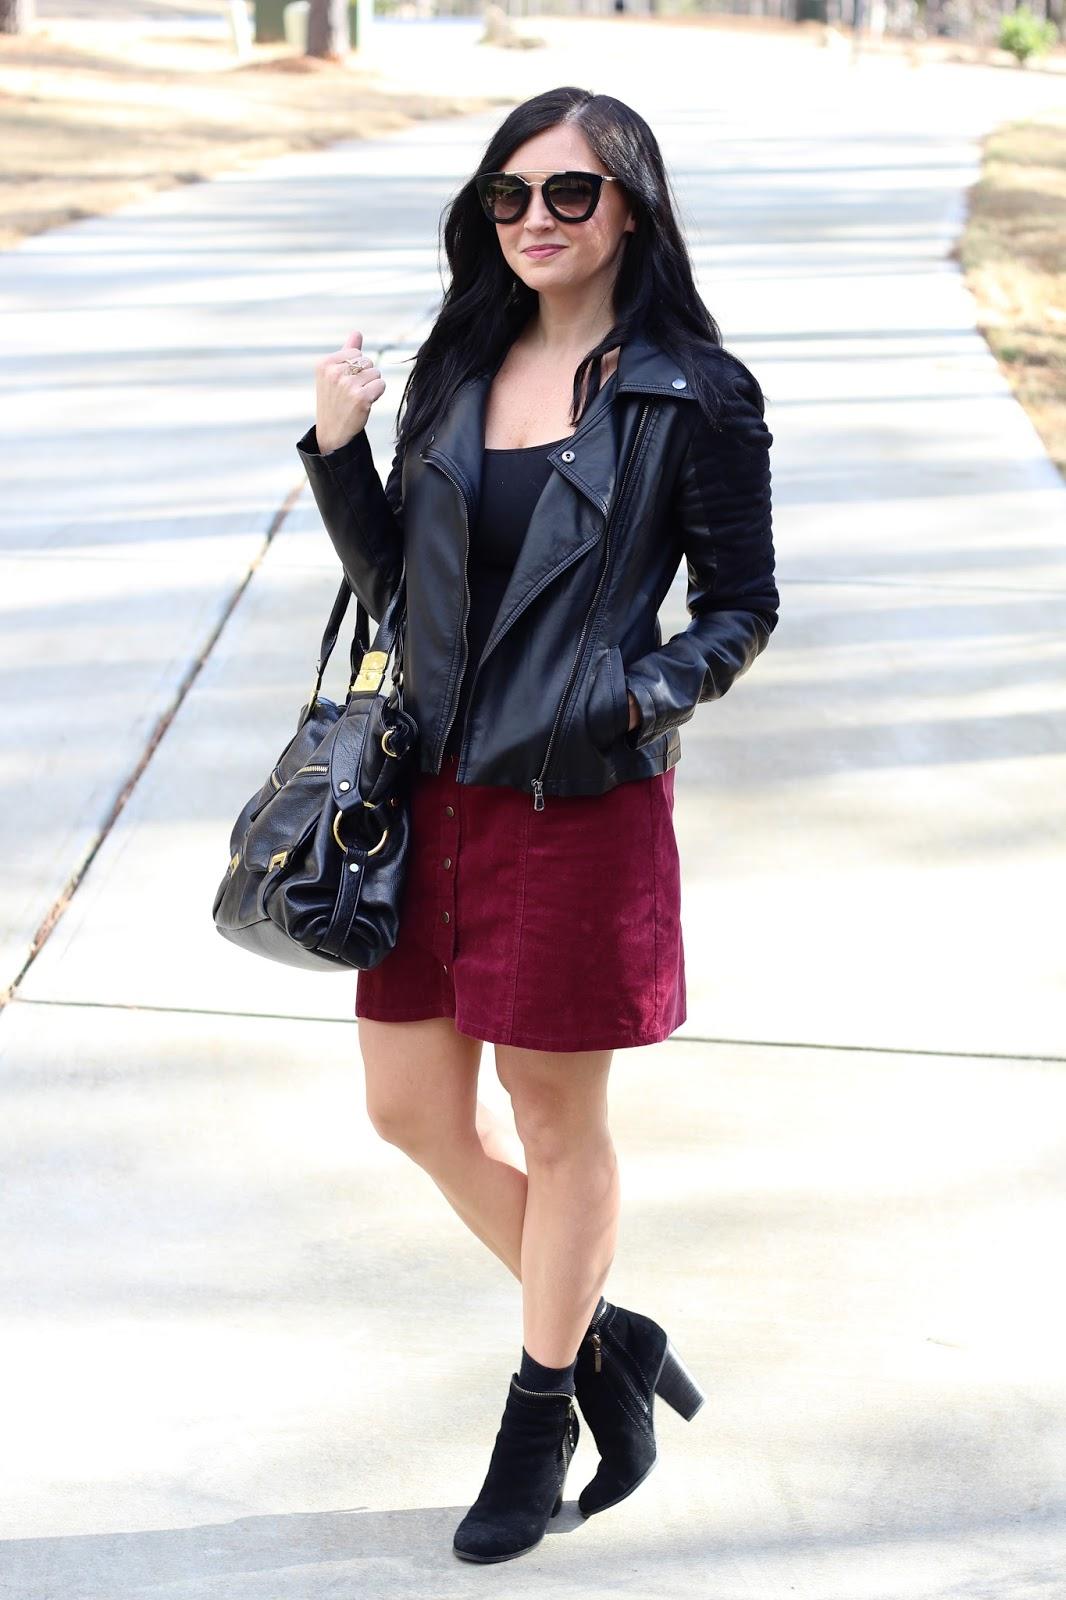 Skirt with Booties, leather jacket, prada sunglasses